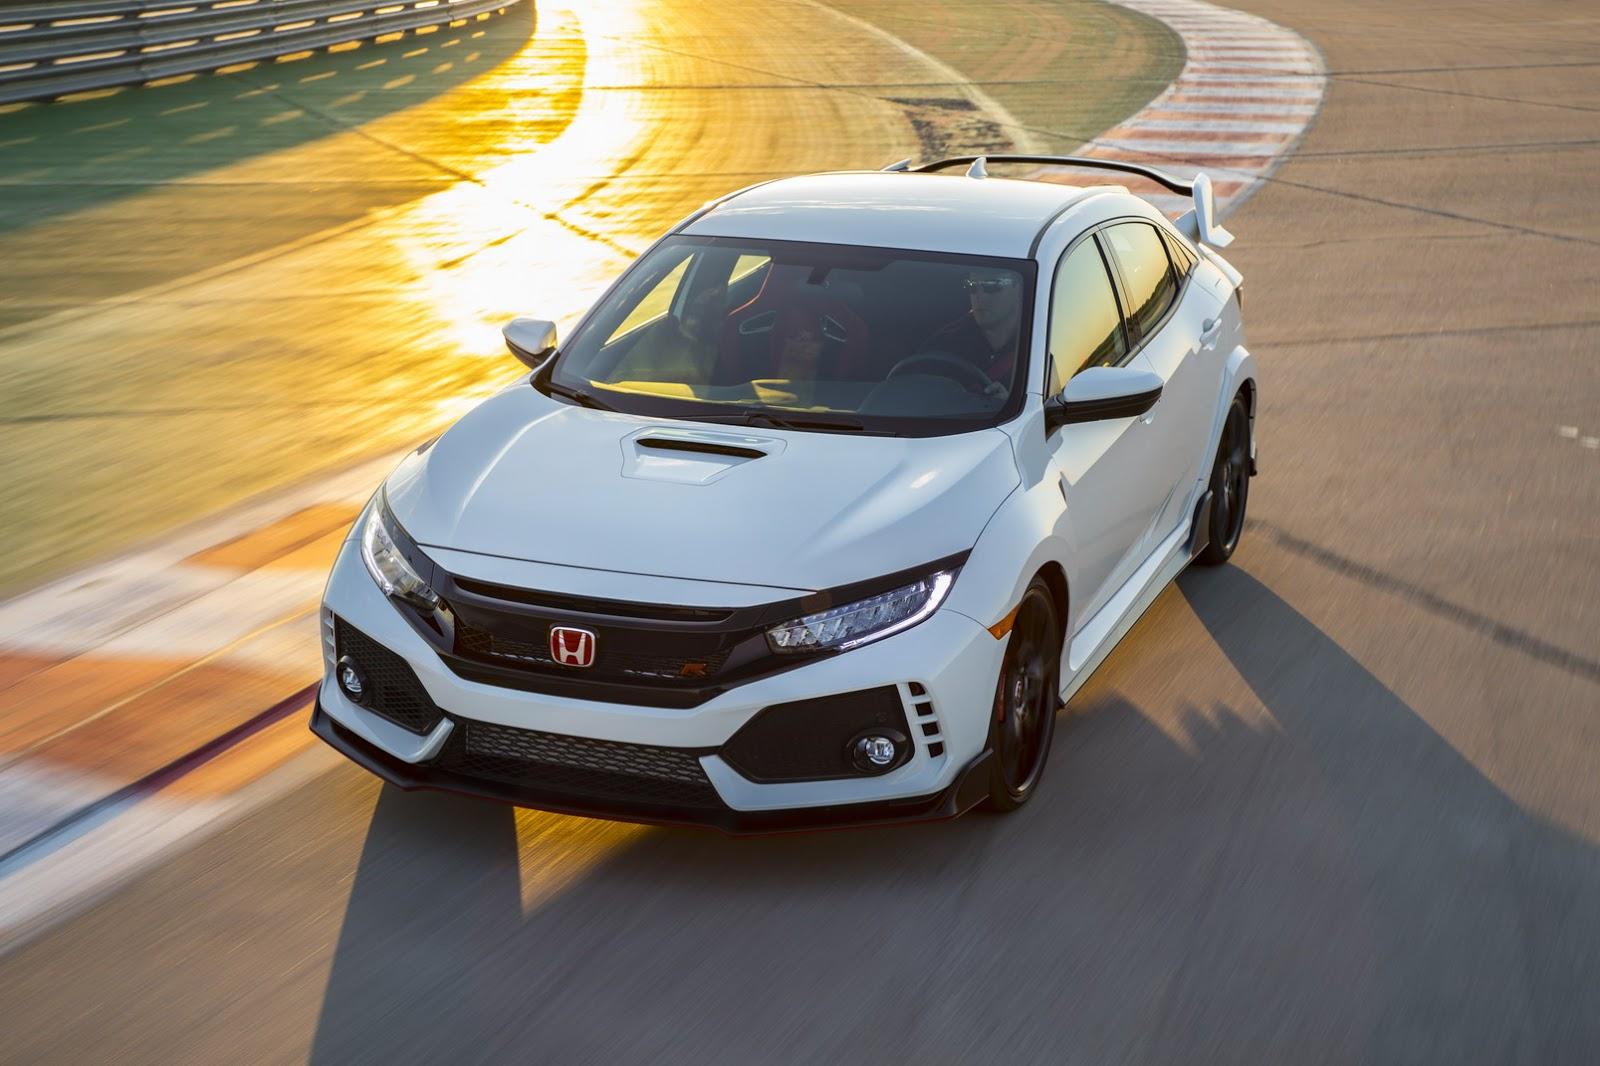 2017_Honda_Civic_Type_R_175